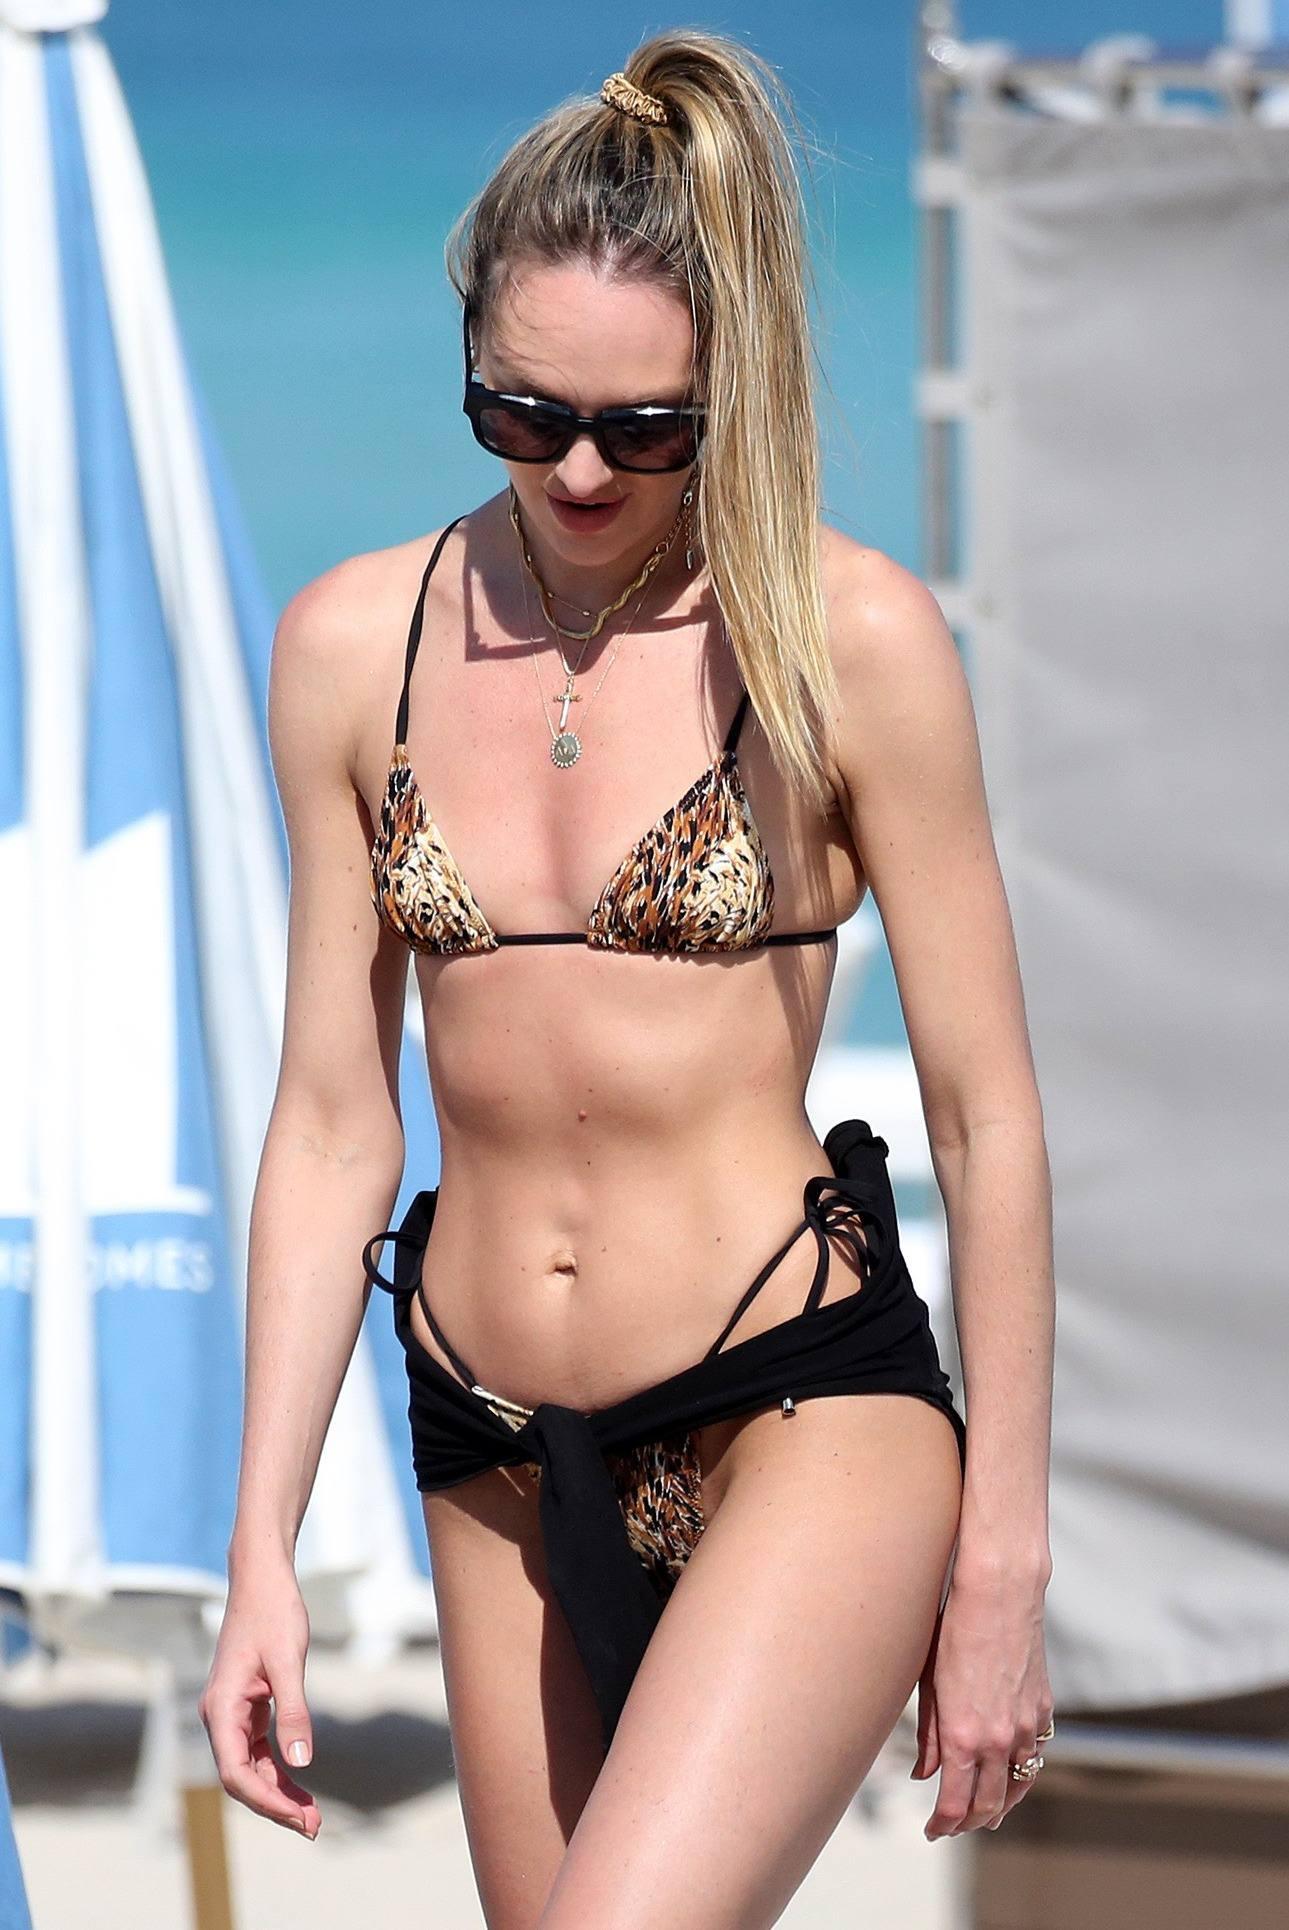 Candice Swanepoel Sexy In Tiny Bikini